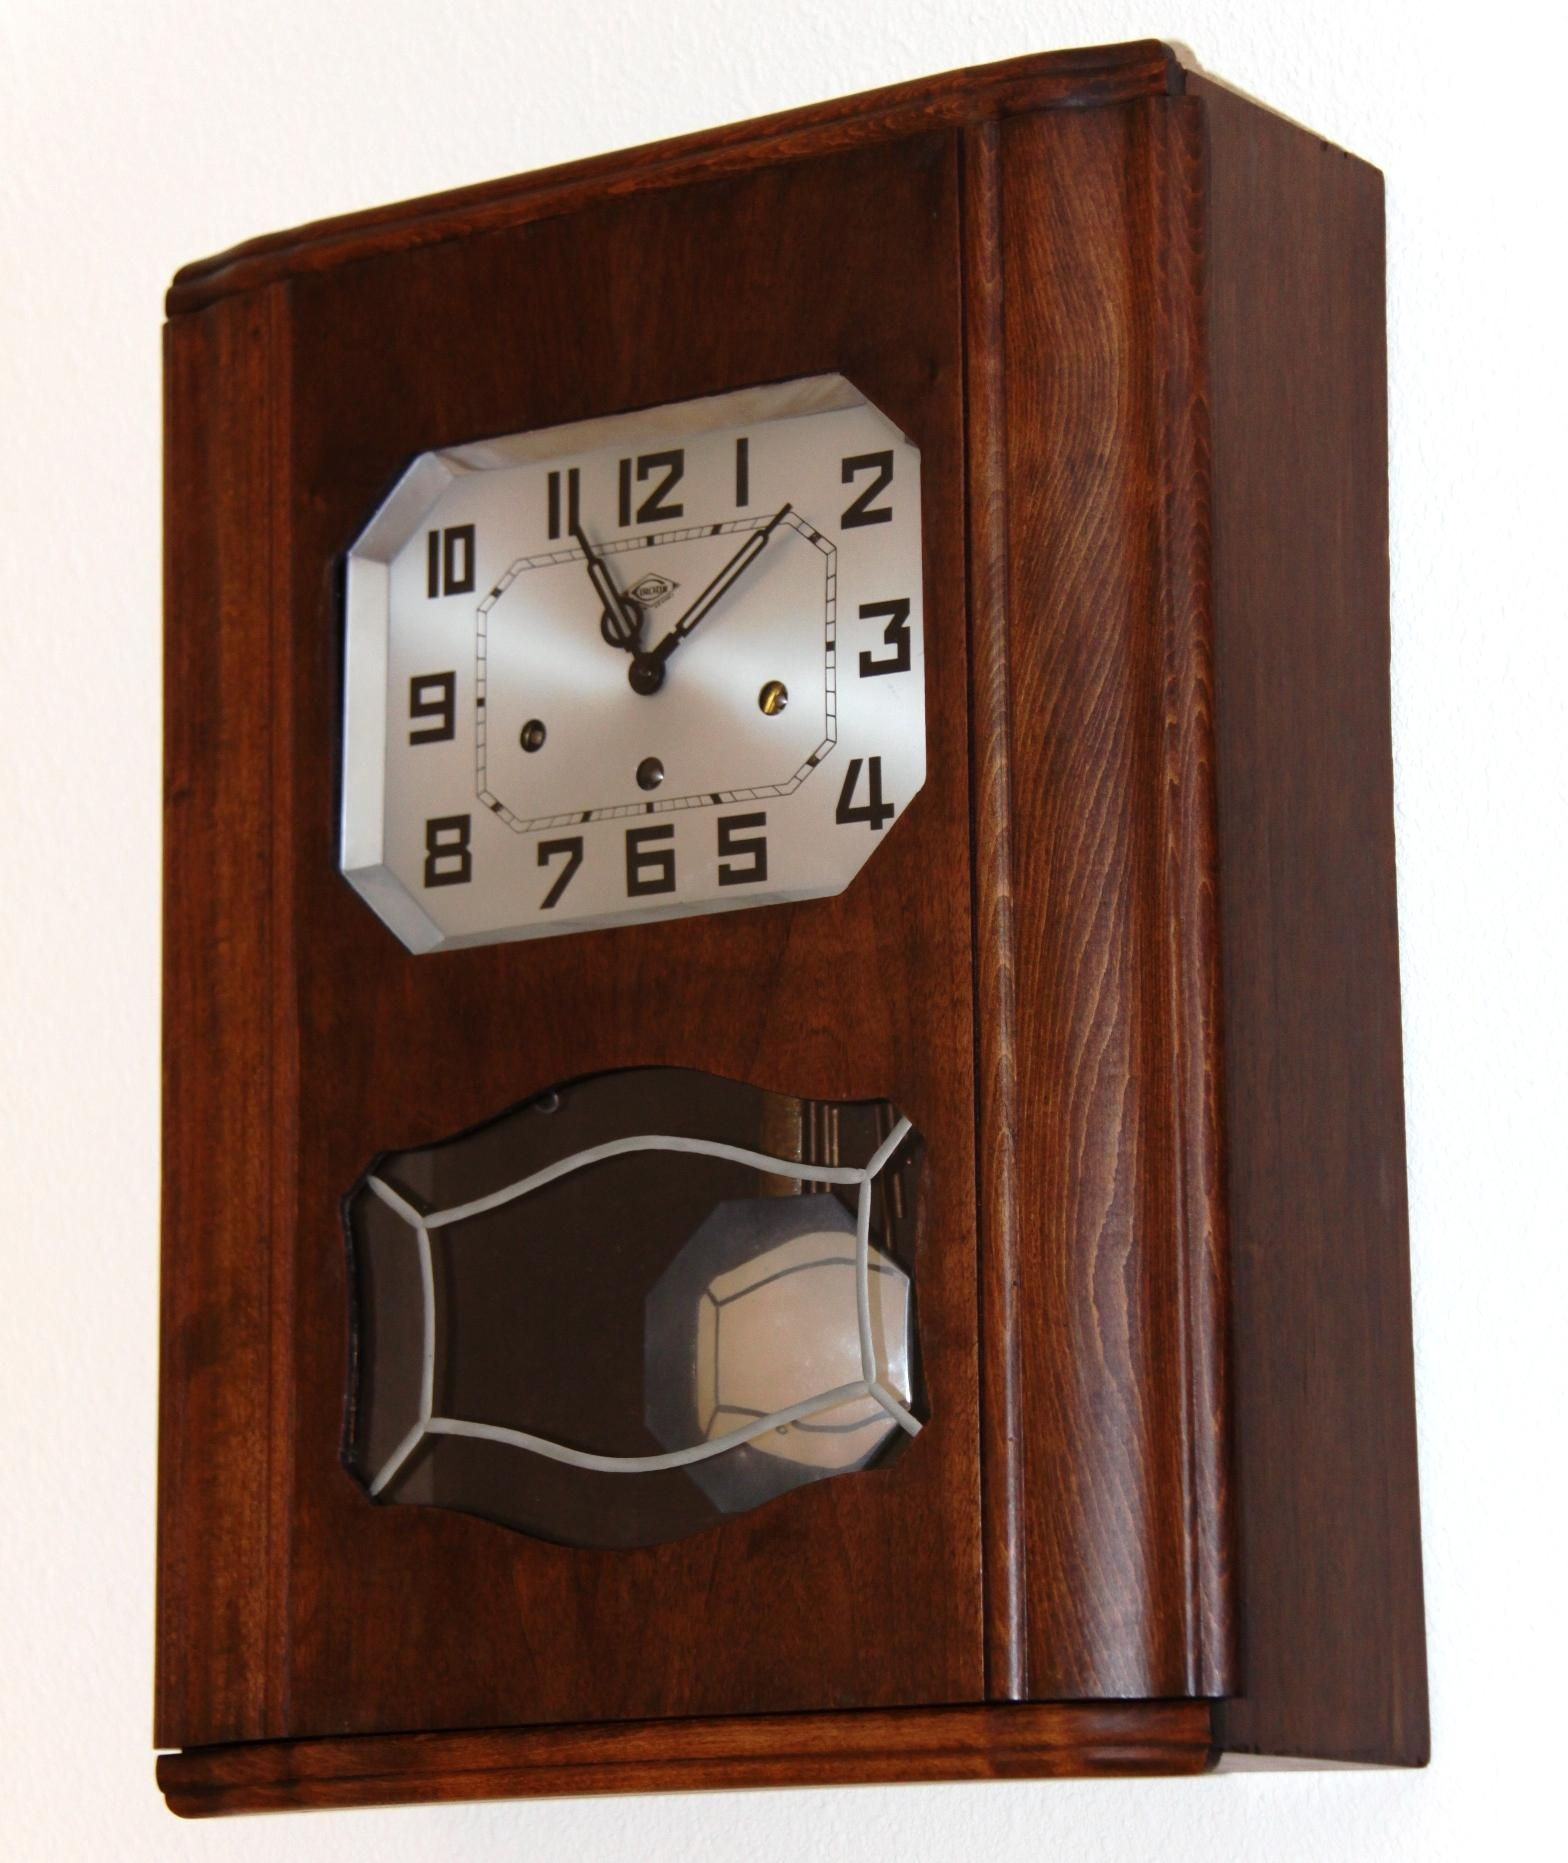 French Irod Clock (Image 14 of 20)